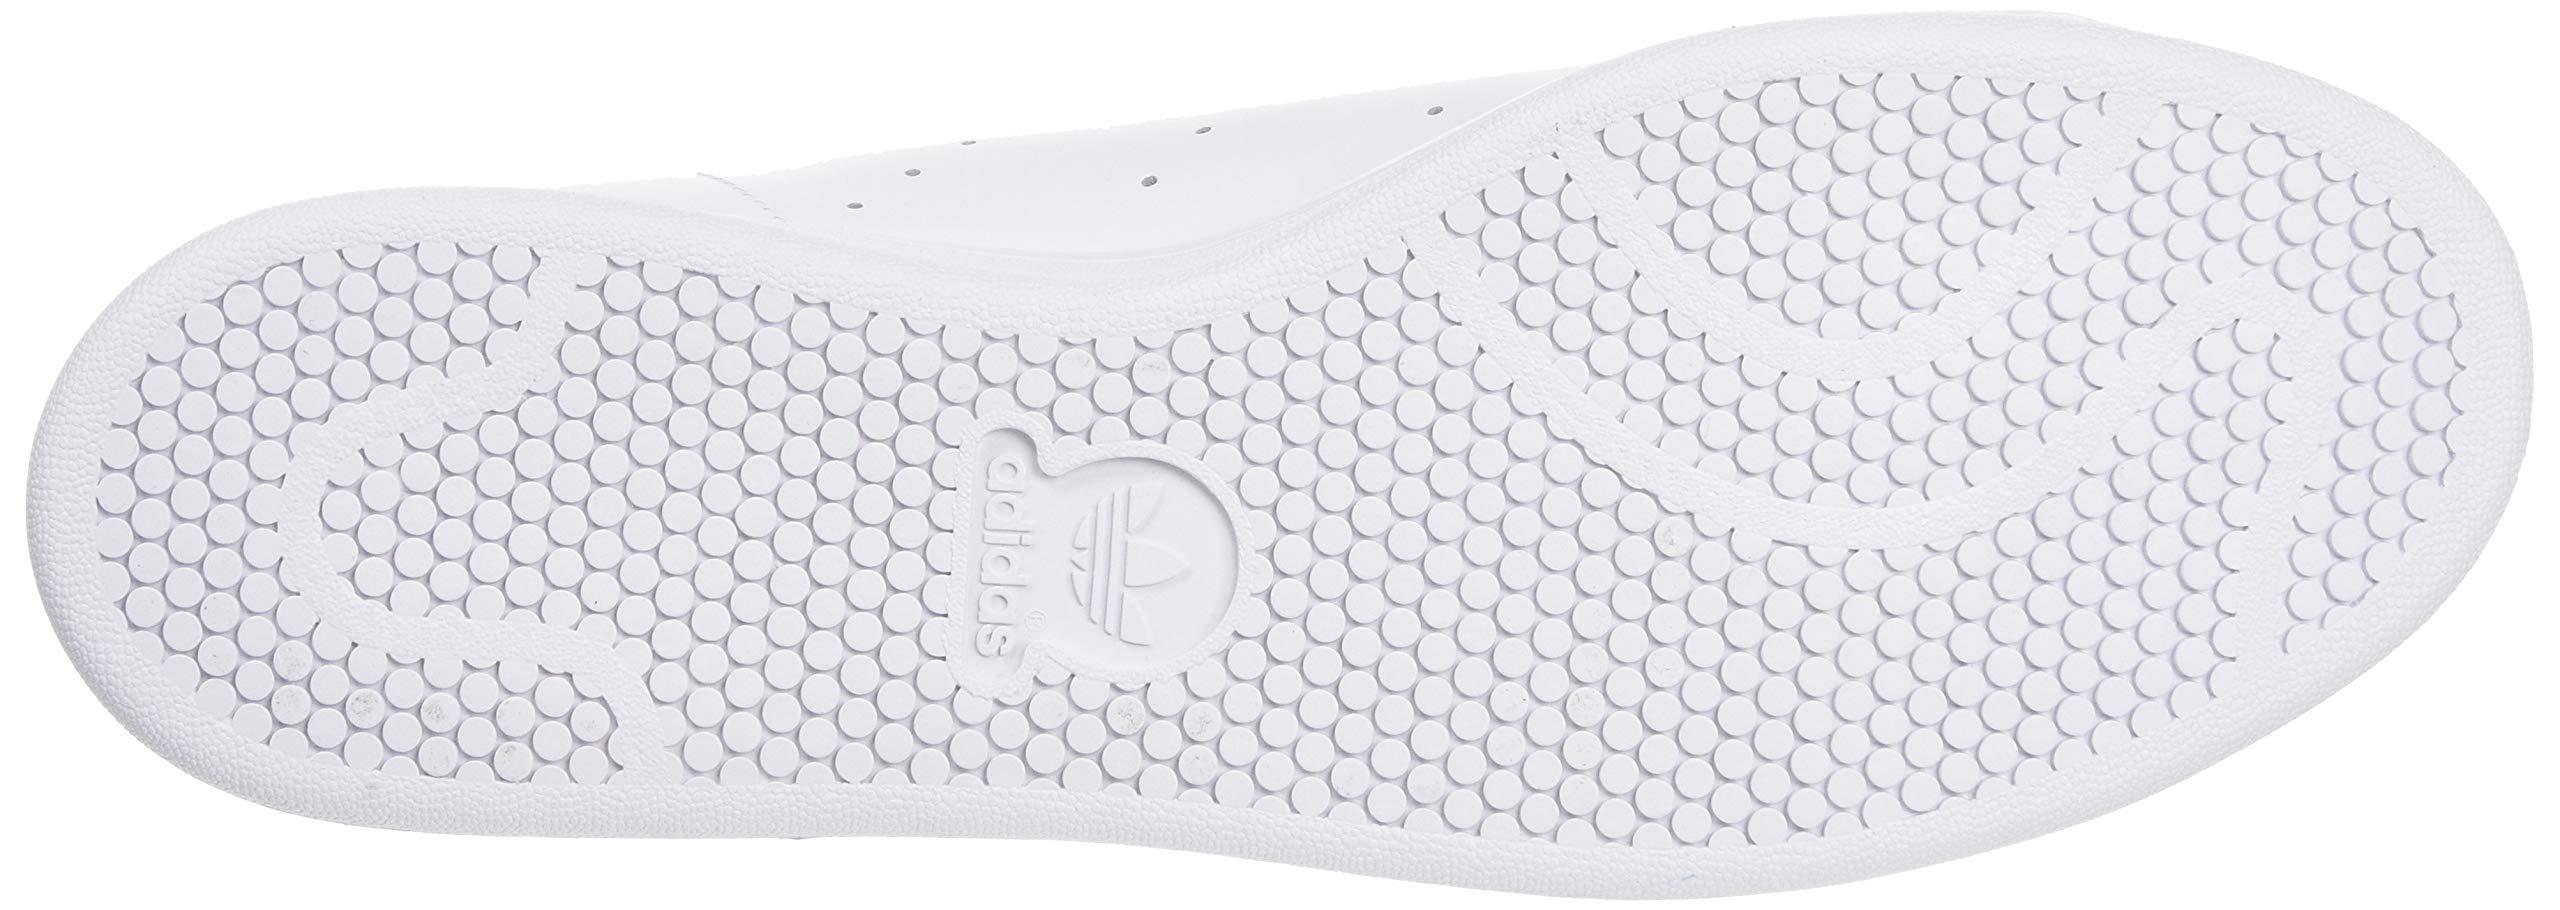 adidas Stan Smith Recon, Scarpe da Ginnastica Uomo 3 spesavip